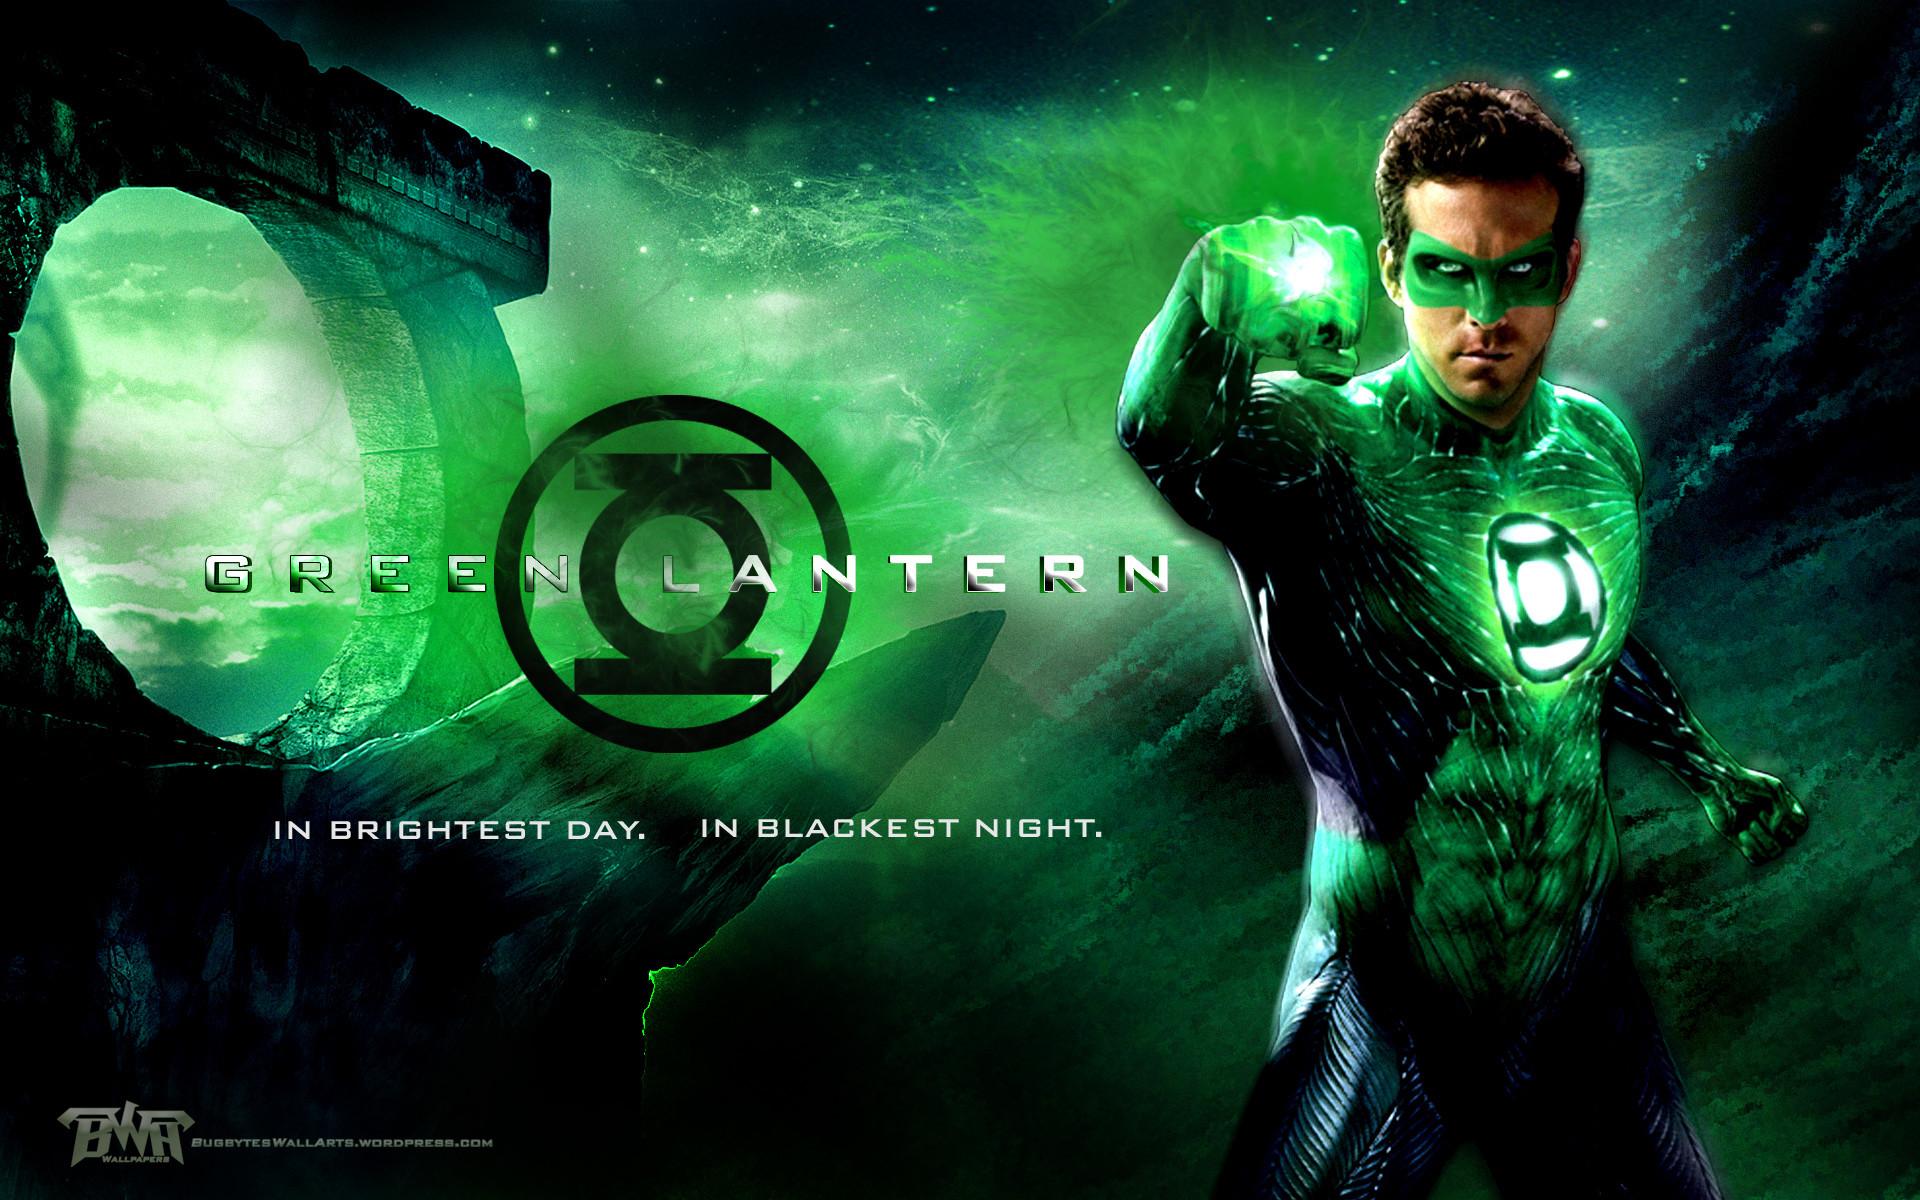 Green Lantern The Movie Wallpaper